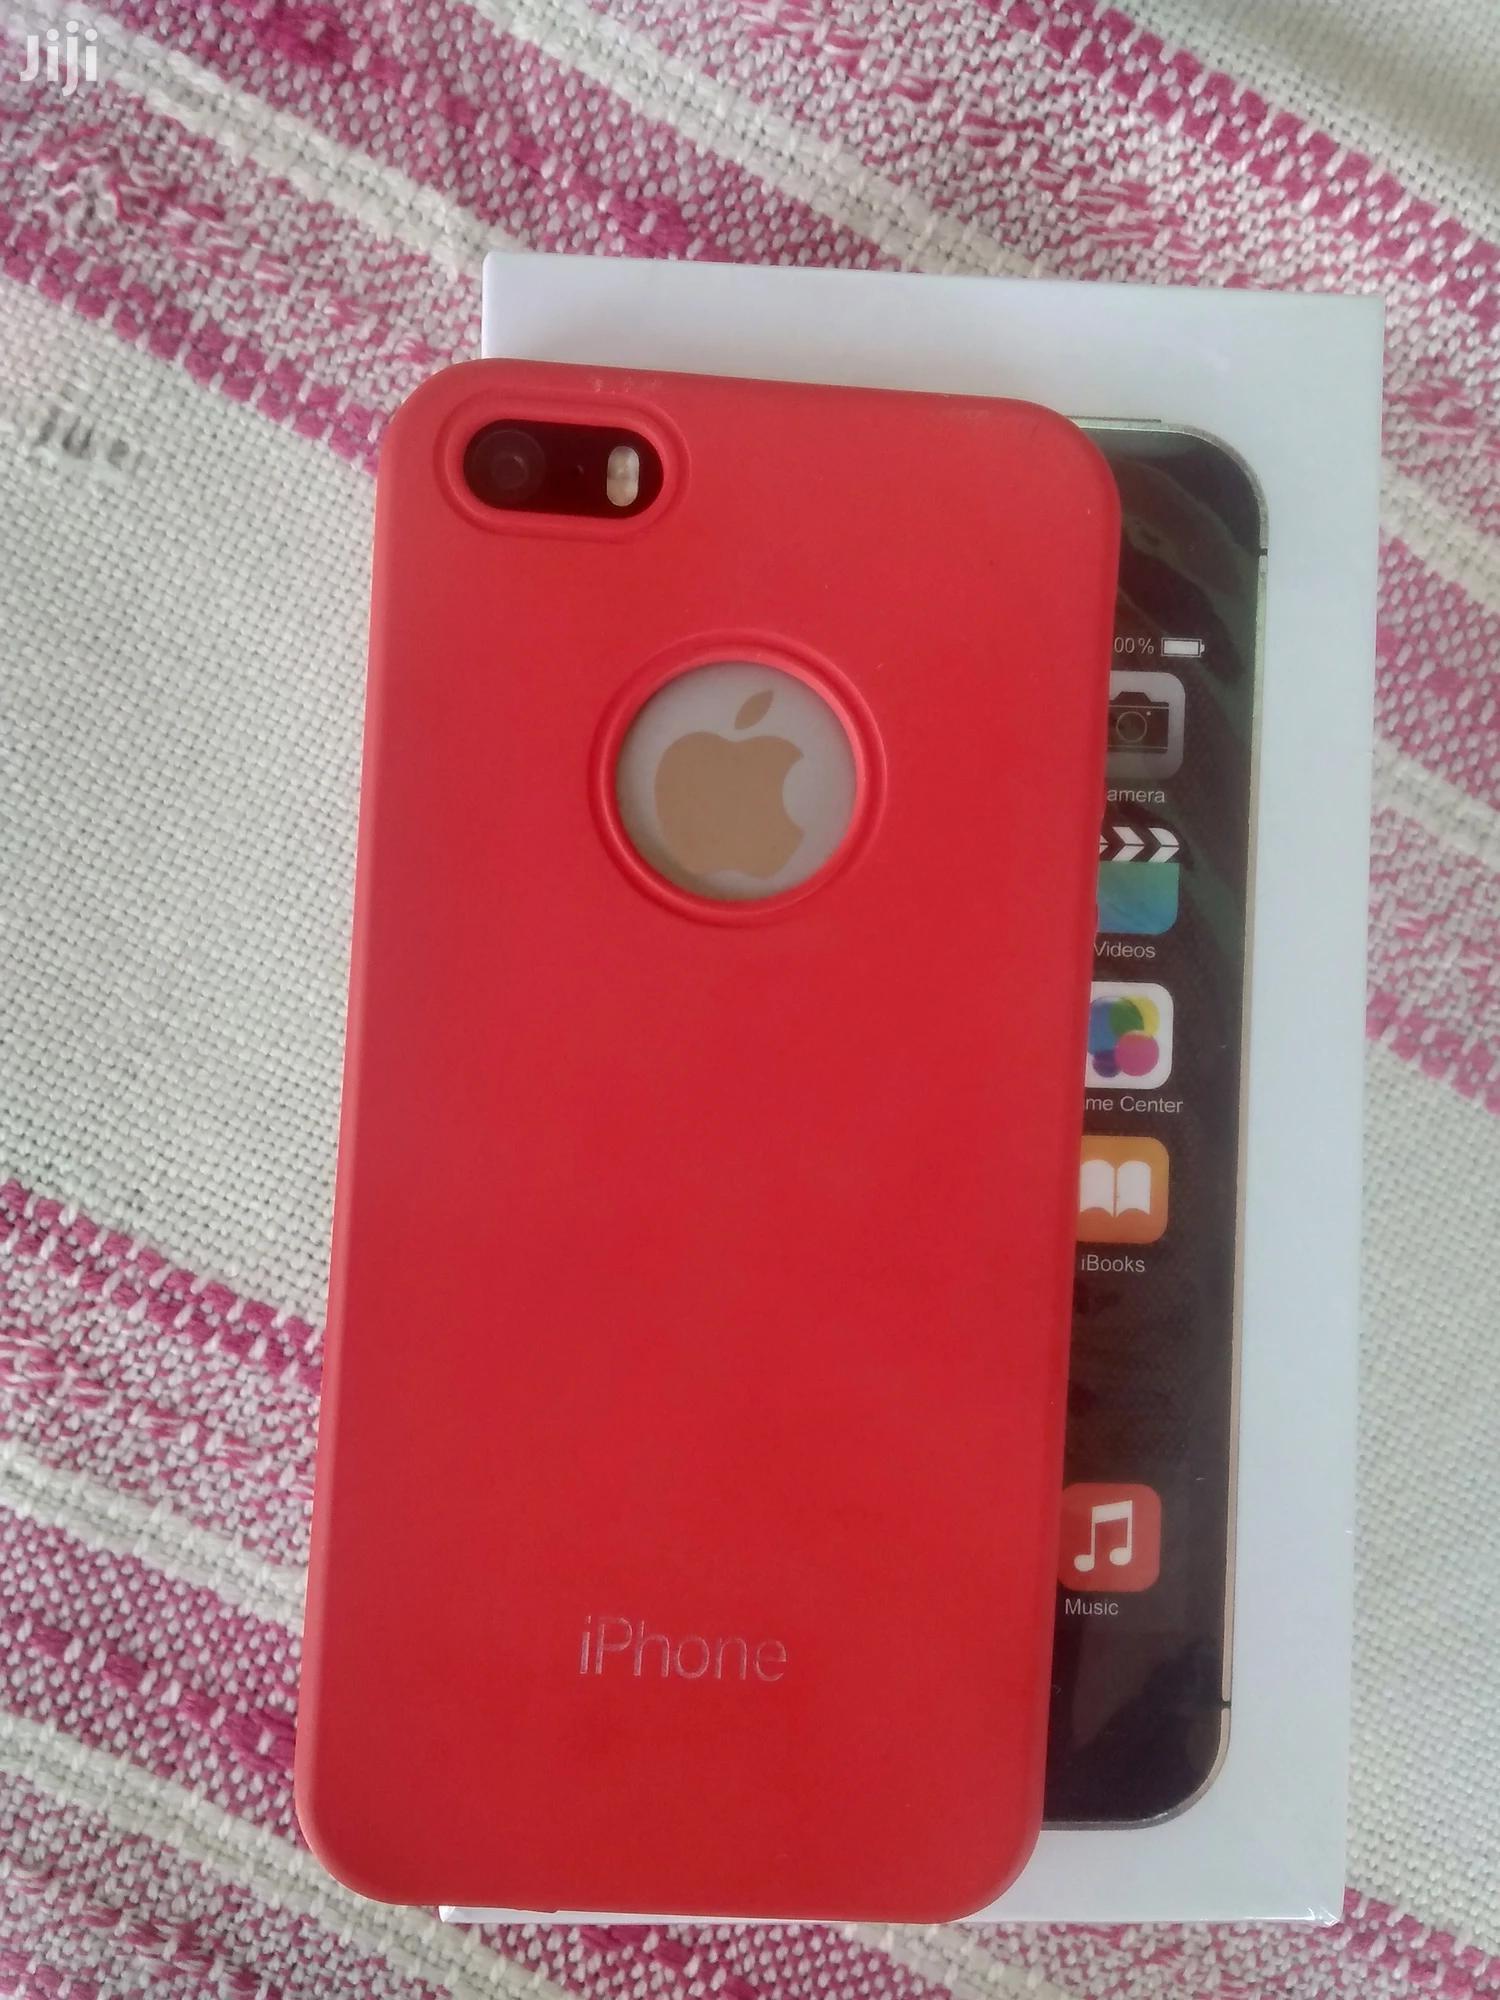 Apple iPhone 5s 16 GB Gray | Mobile Phones for sale in Accra Metropolitan, Greater Accra, Ghana